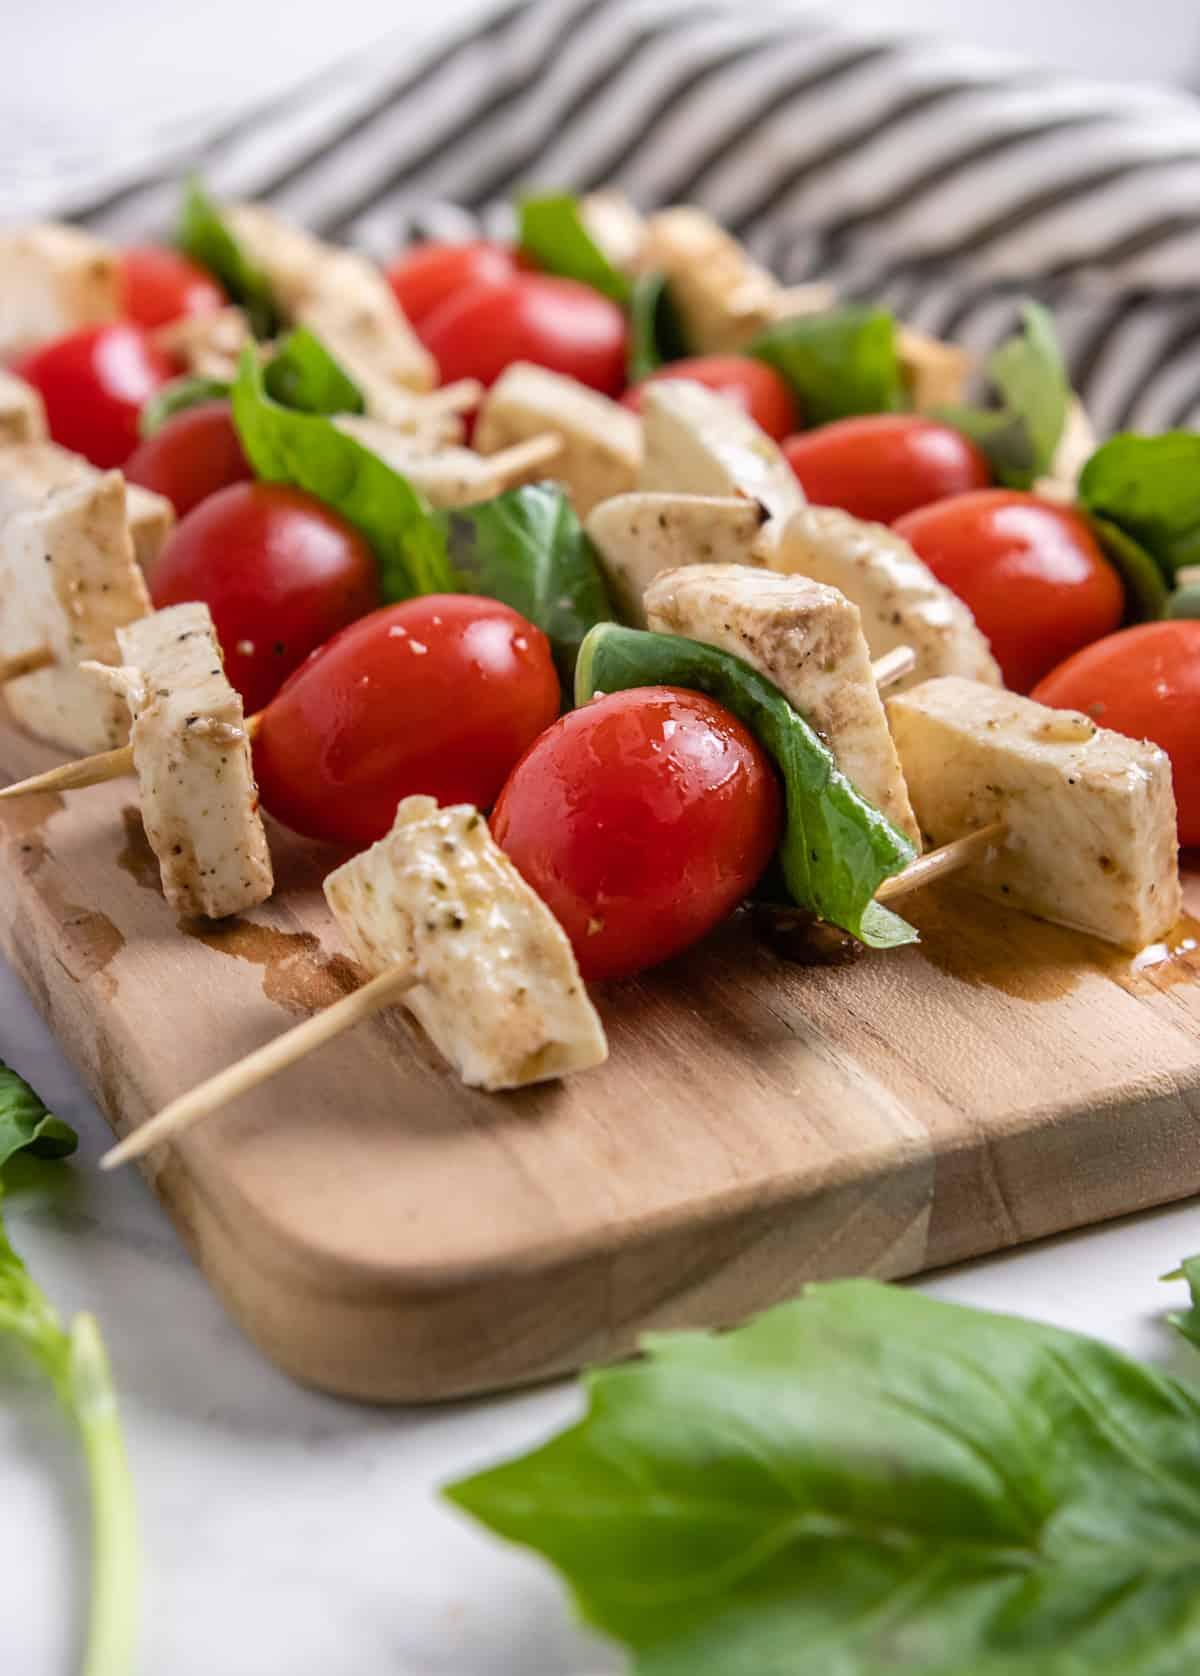 Mozzarella, tomato and basil on toothpicks arranged on wood board.